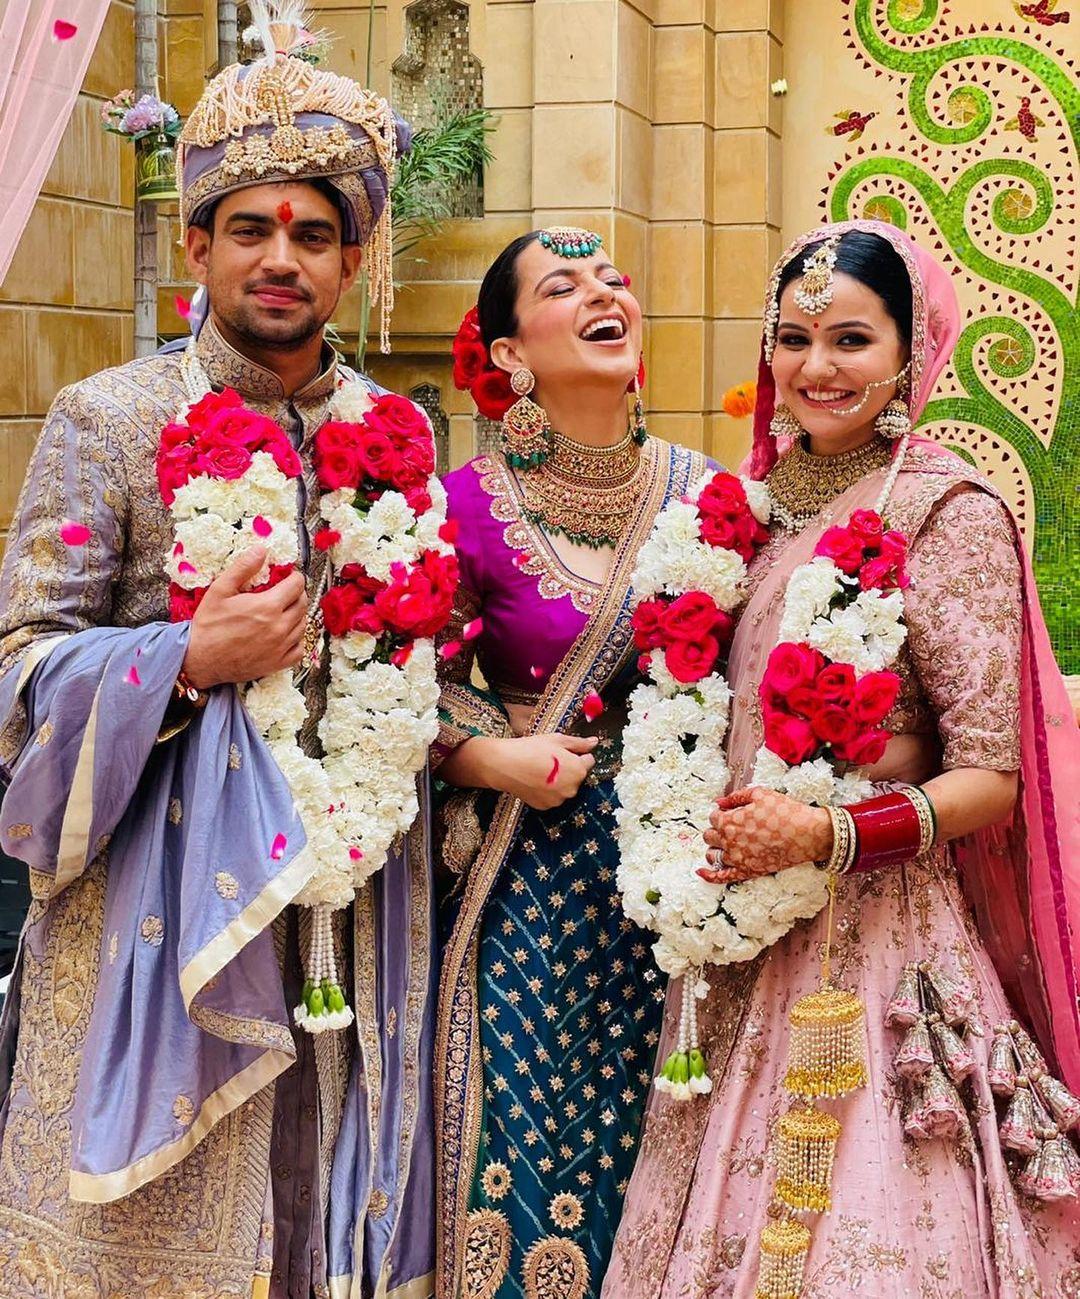 Kangana Ranaut%E2%80%99s Brother Aksht%E2%80%99s Wedding01